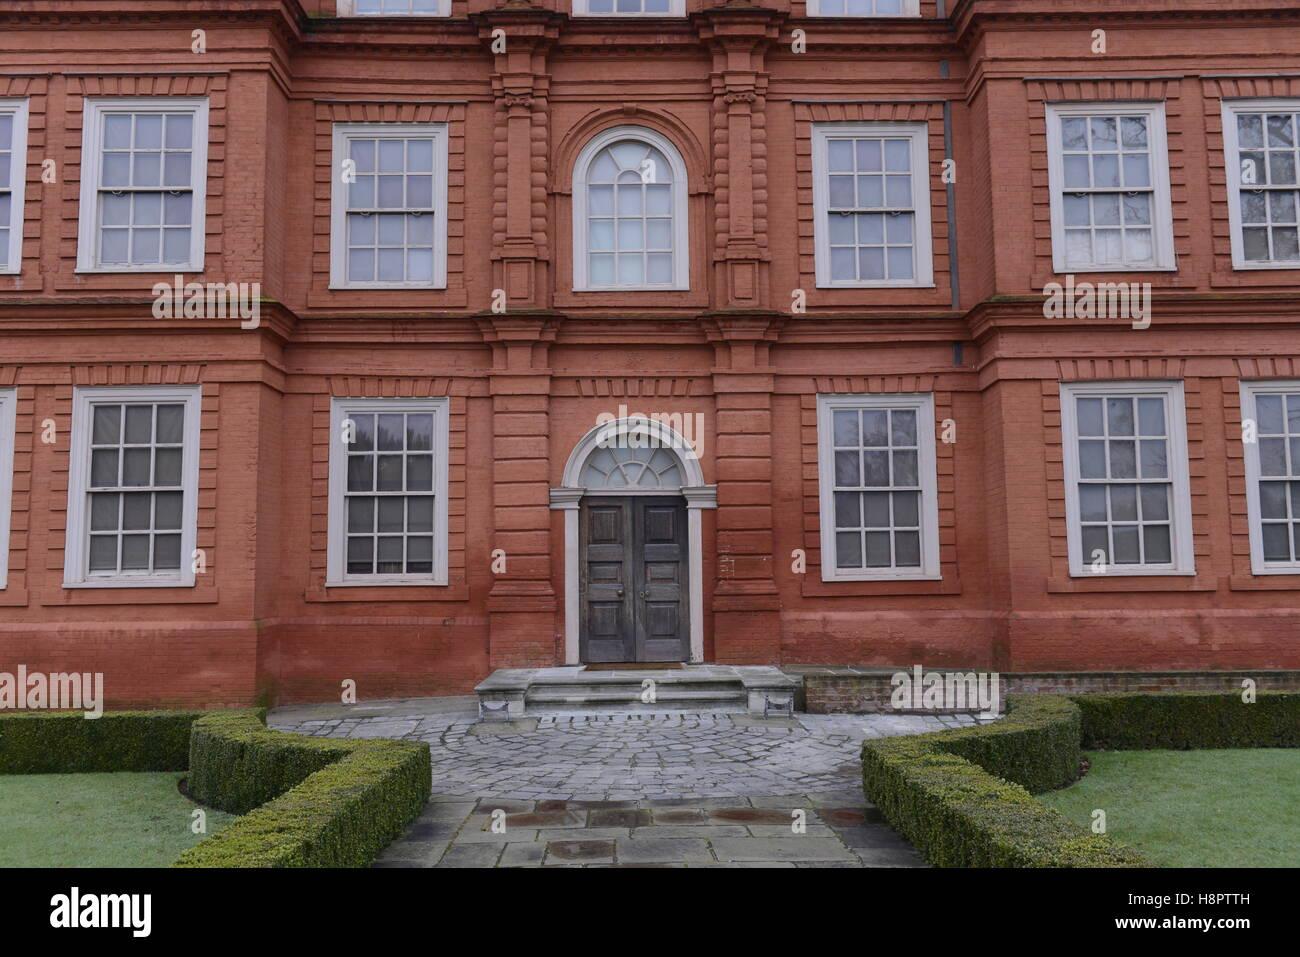 Kew Palace kitchens building, Kew Gardens London - Stock Image